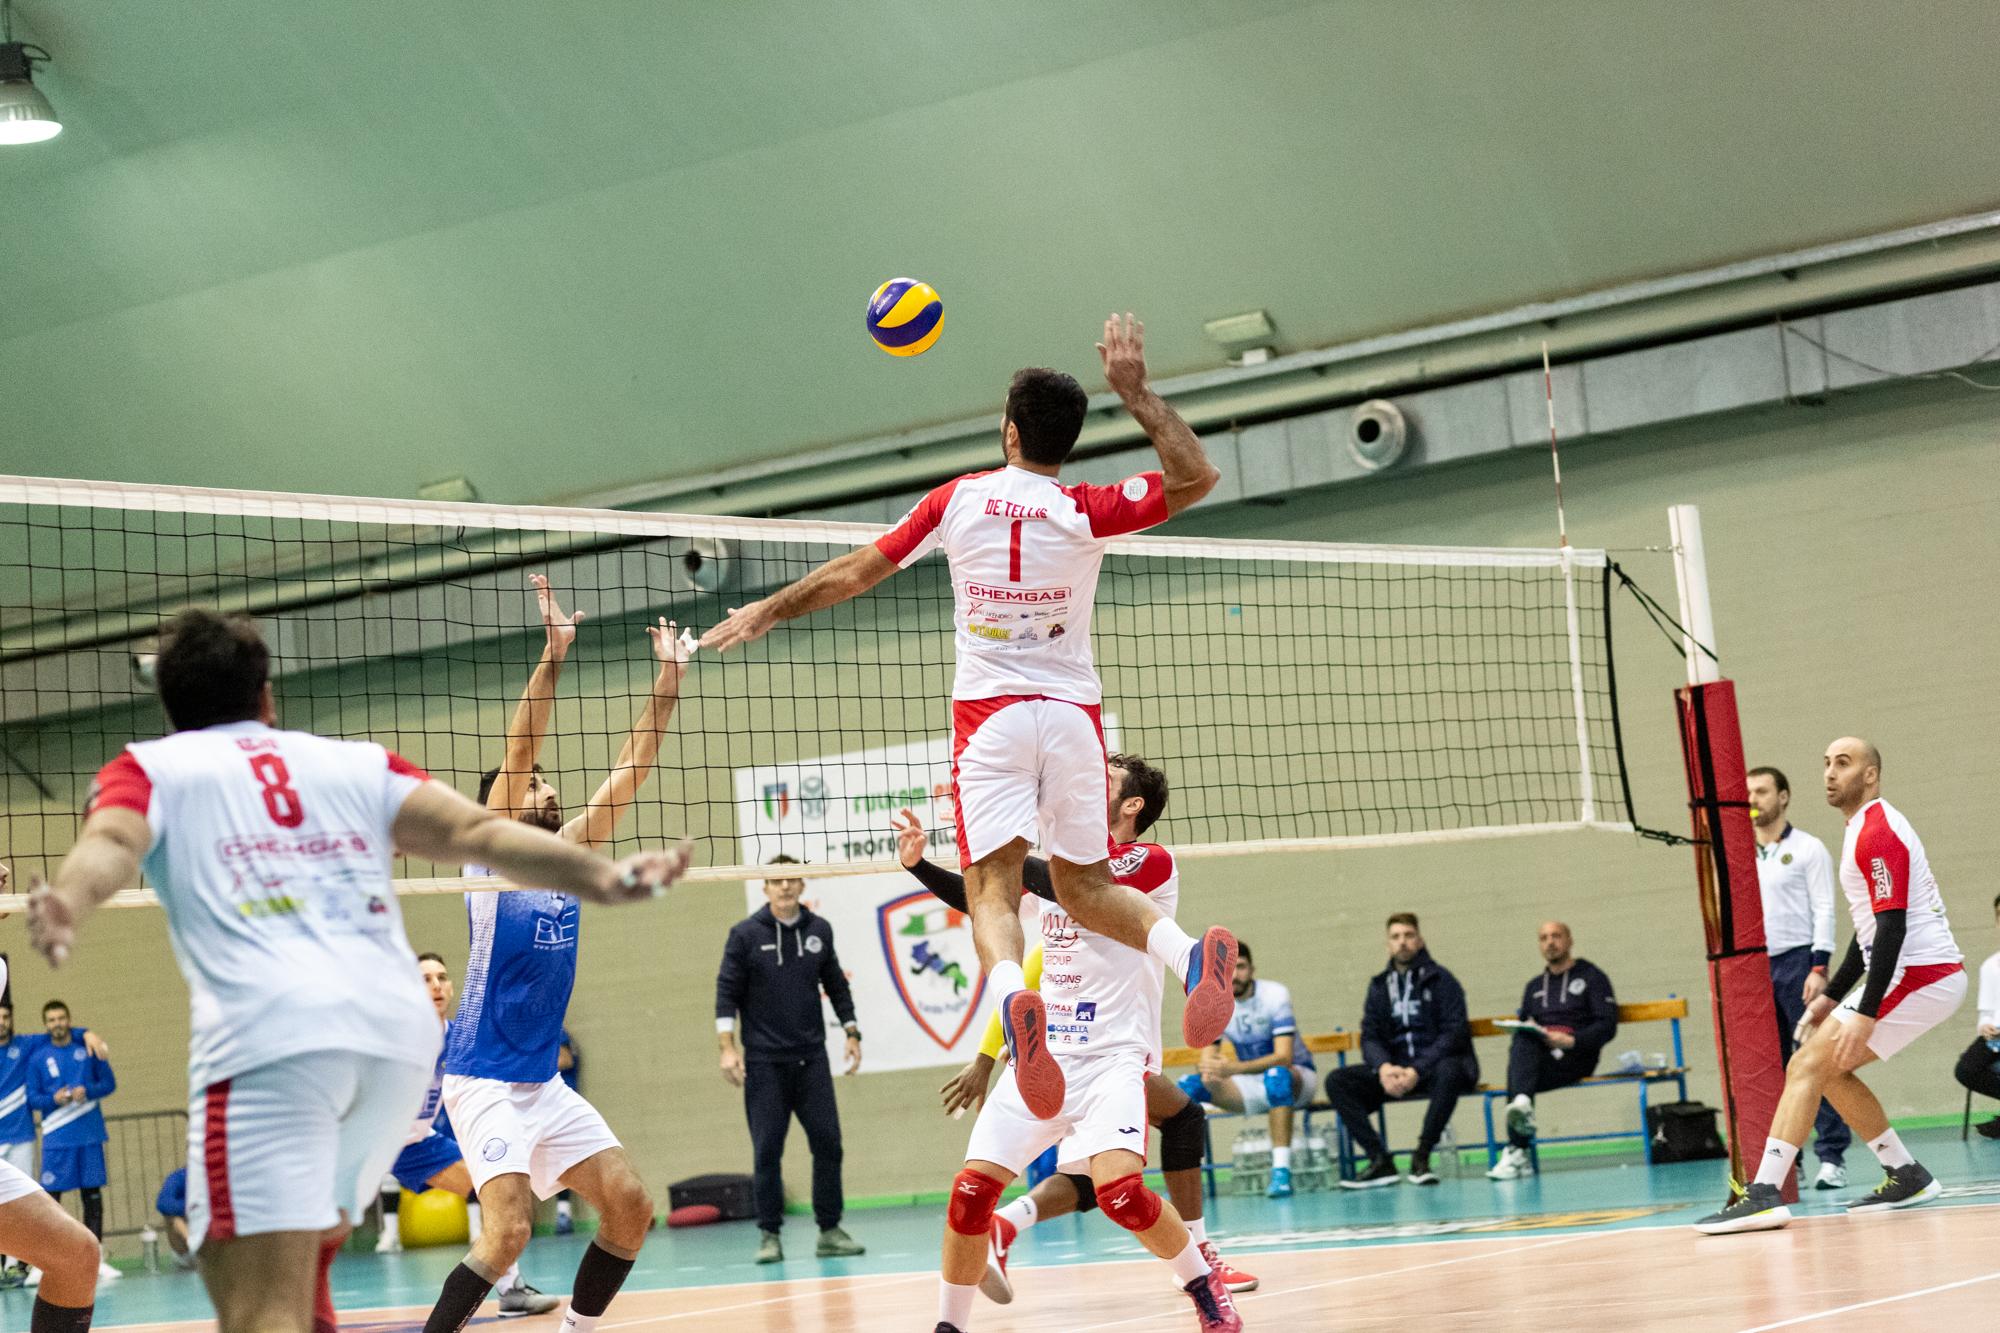 La M2G Group Bari torna al PalaCarbonara: domani la sfida contro l'Ancona